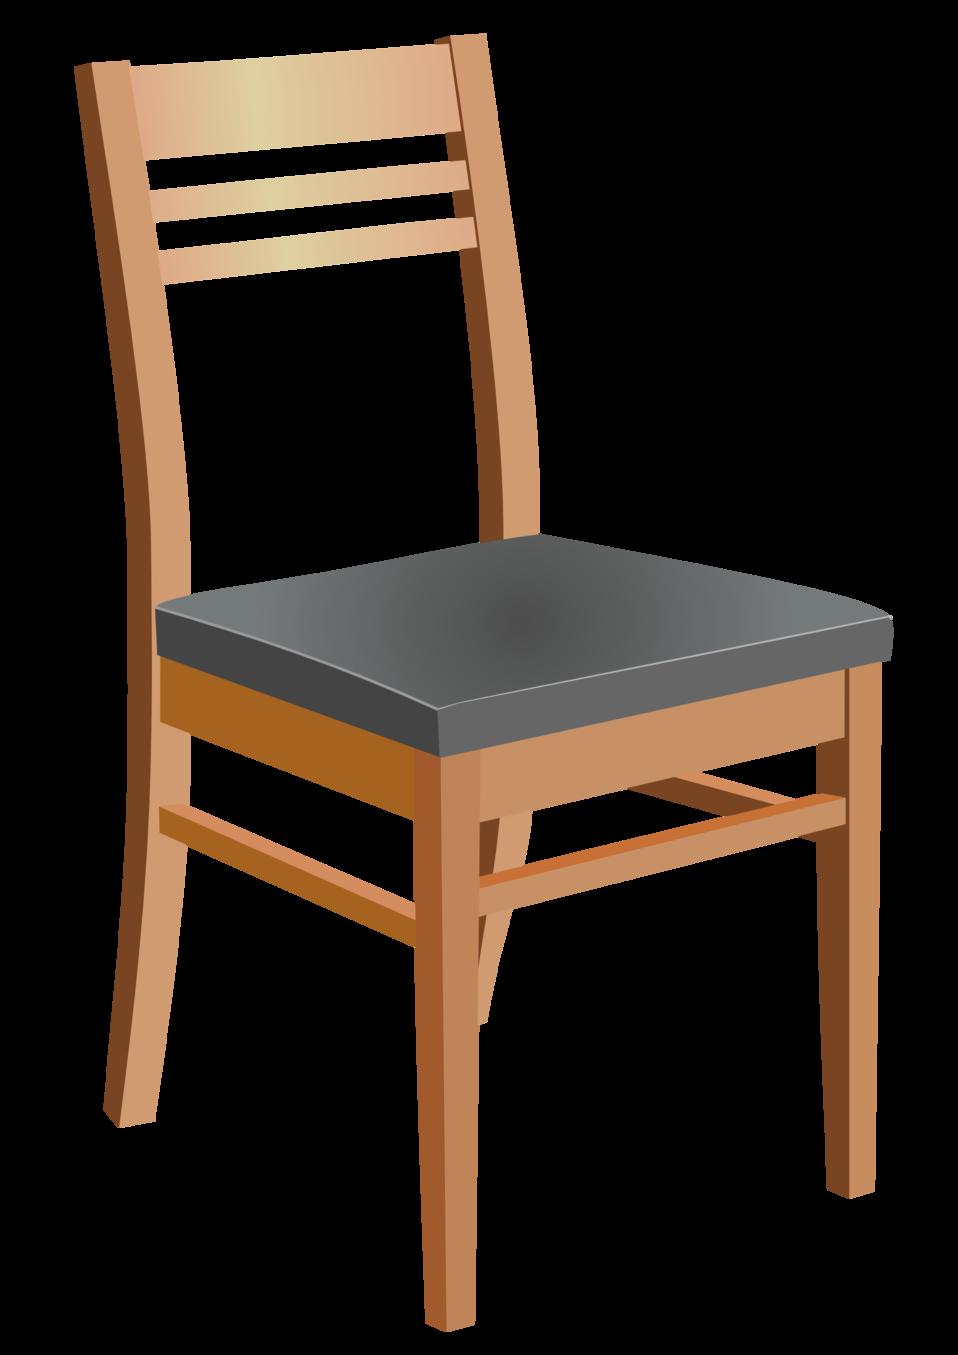 Furniture used furniture